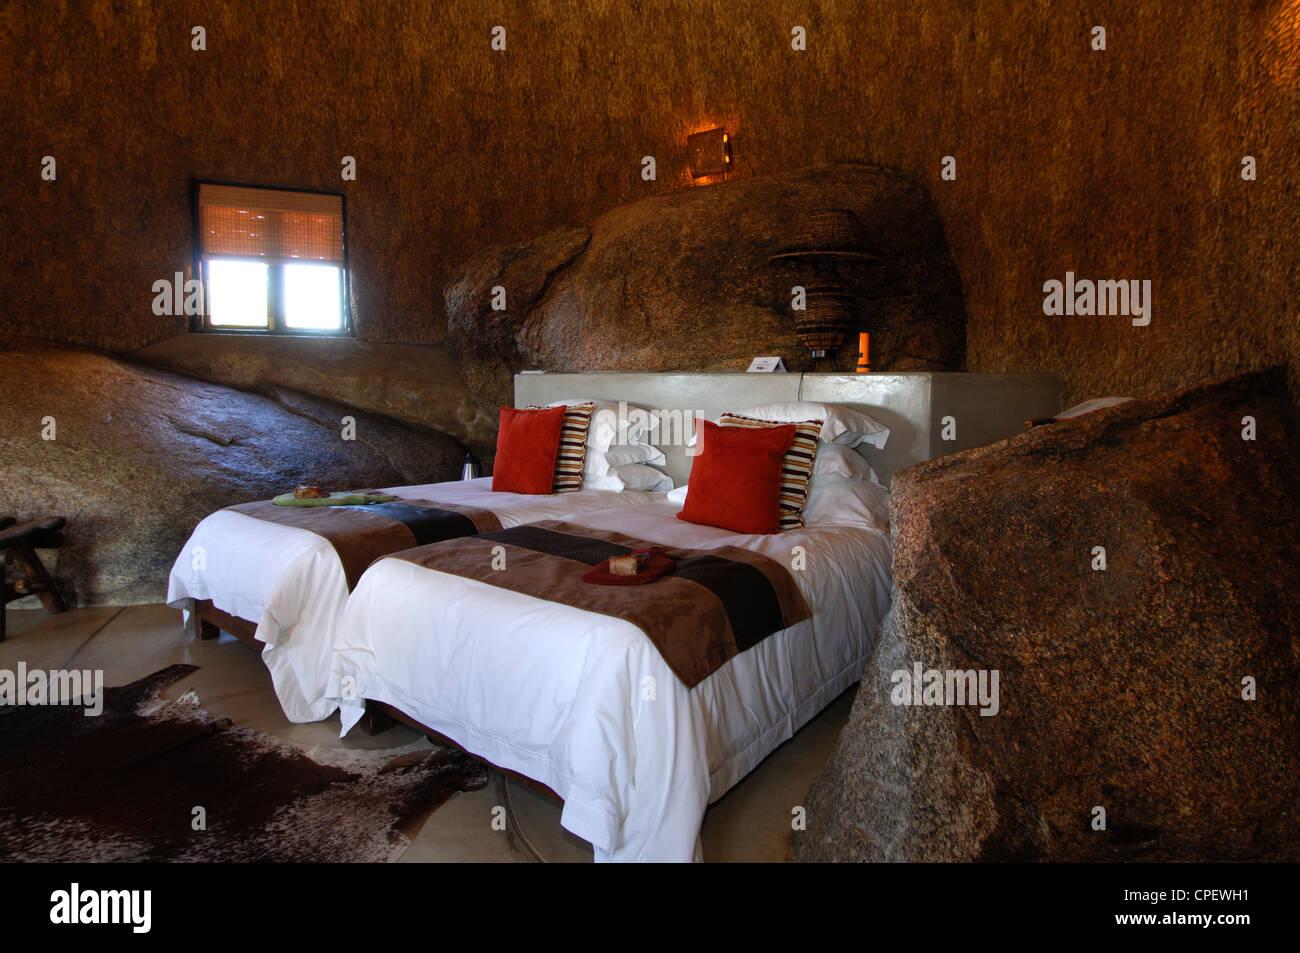 Interior of a Namakwa Mountain Suite, Naries Namakwa Retreat, Naries, South Africa - Stock Image